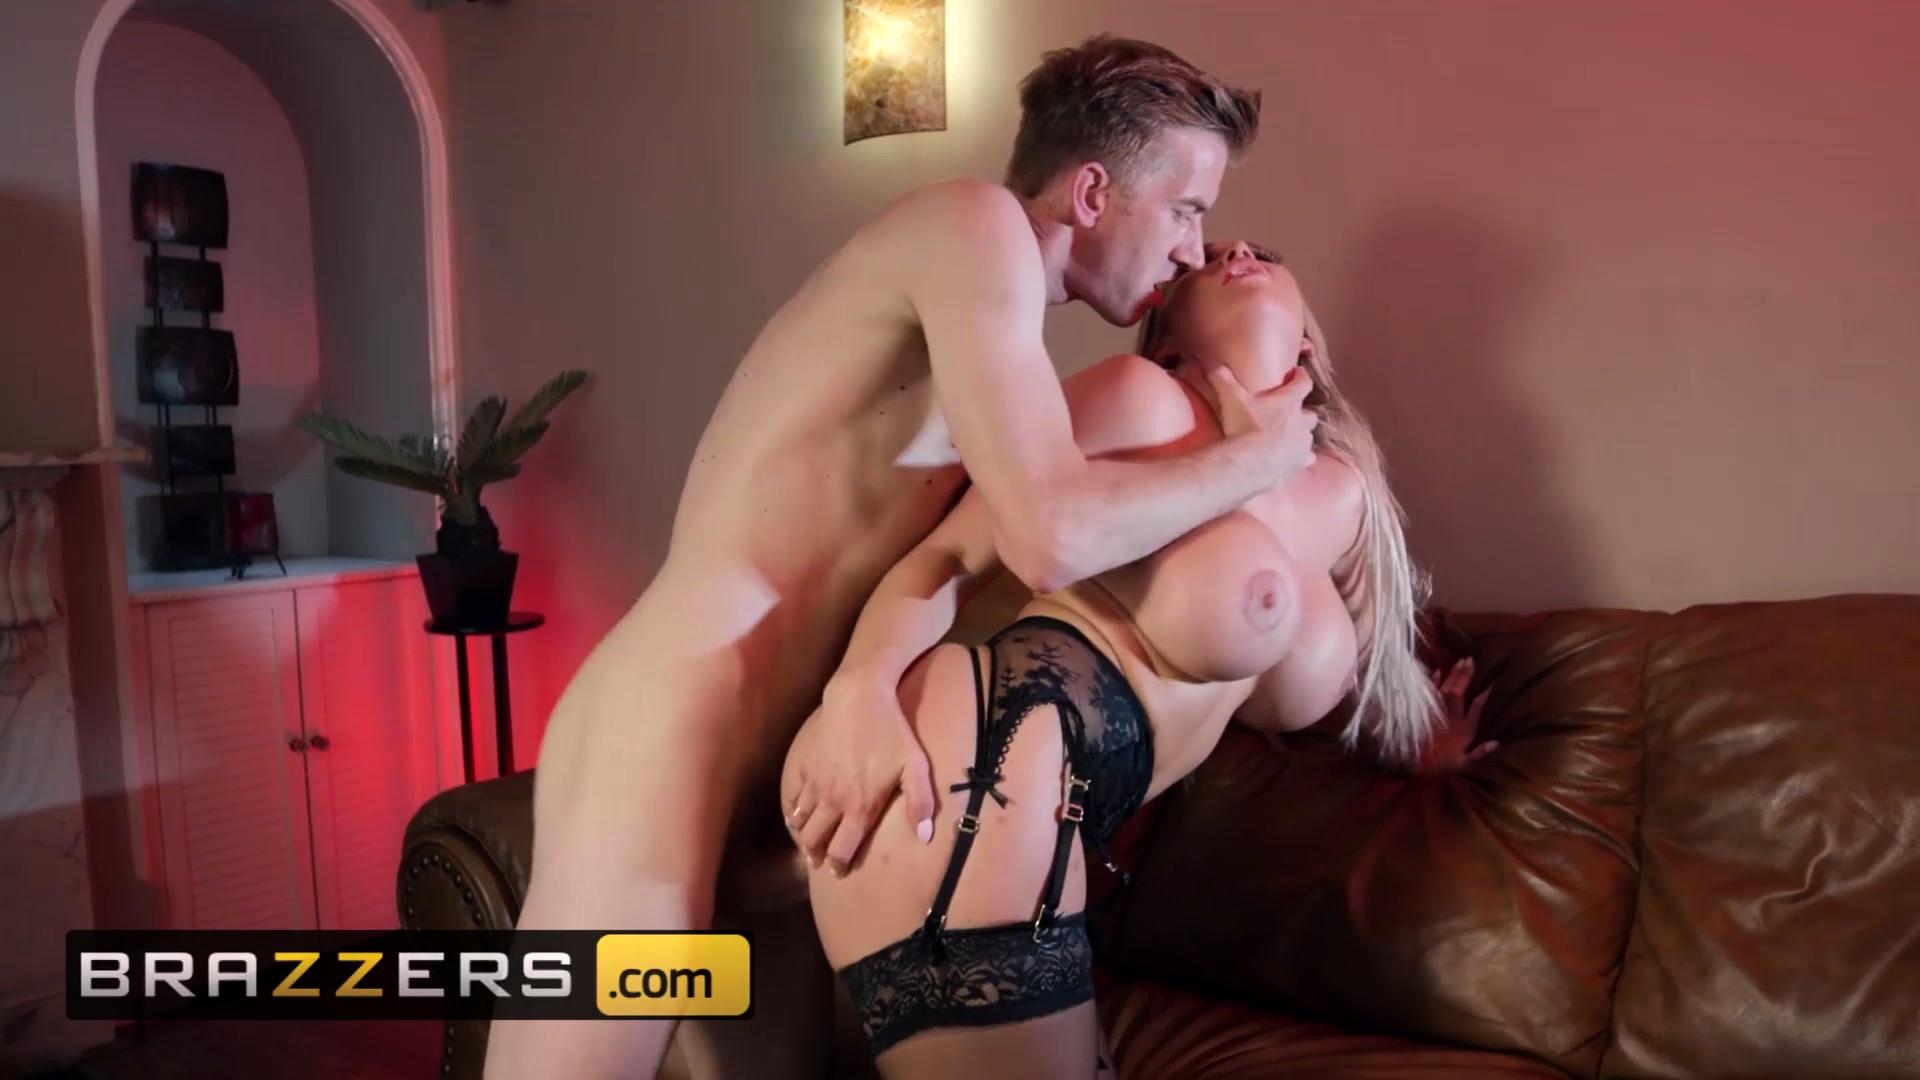 brazzers mobile porn sexy bbw porno fotky